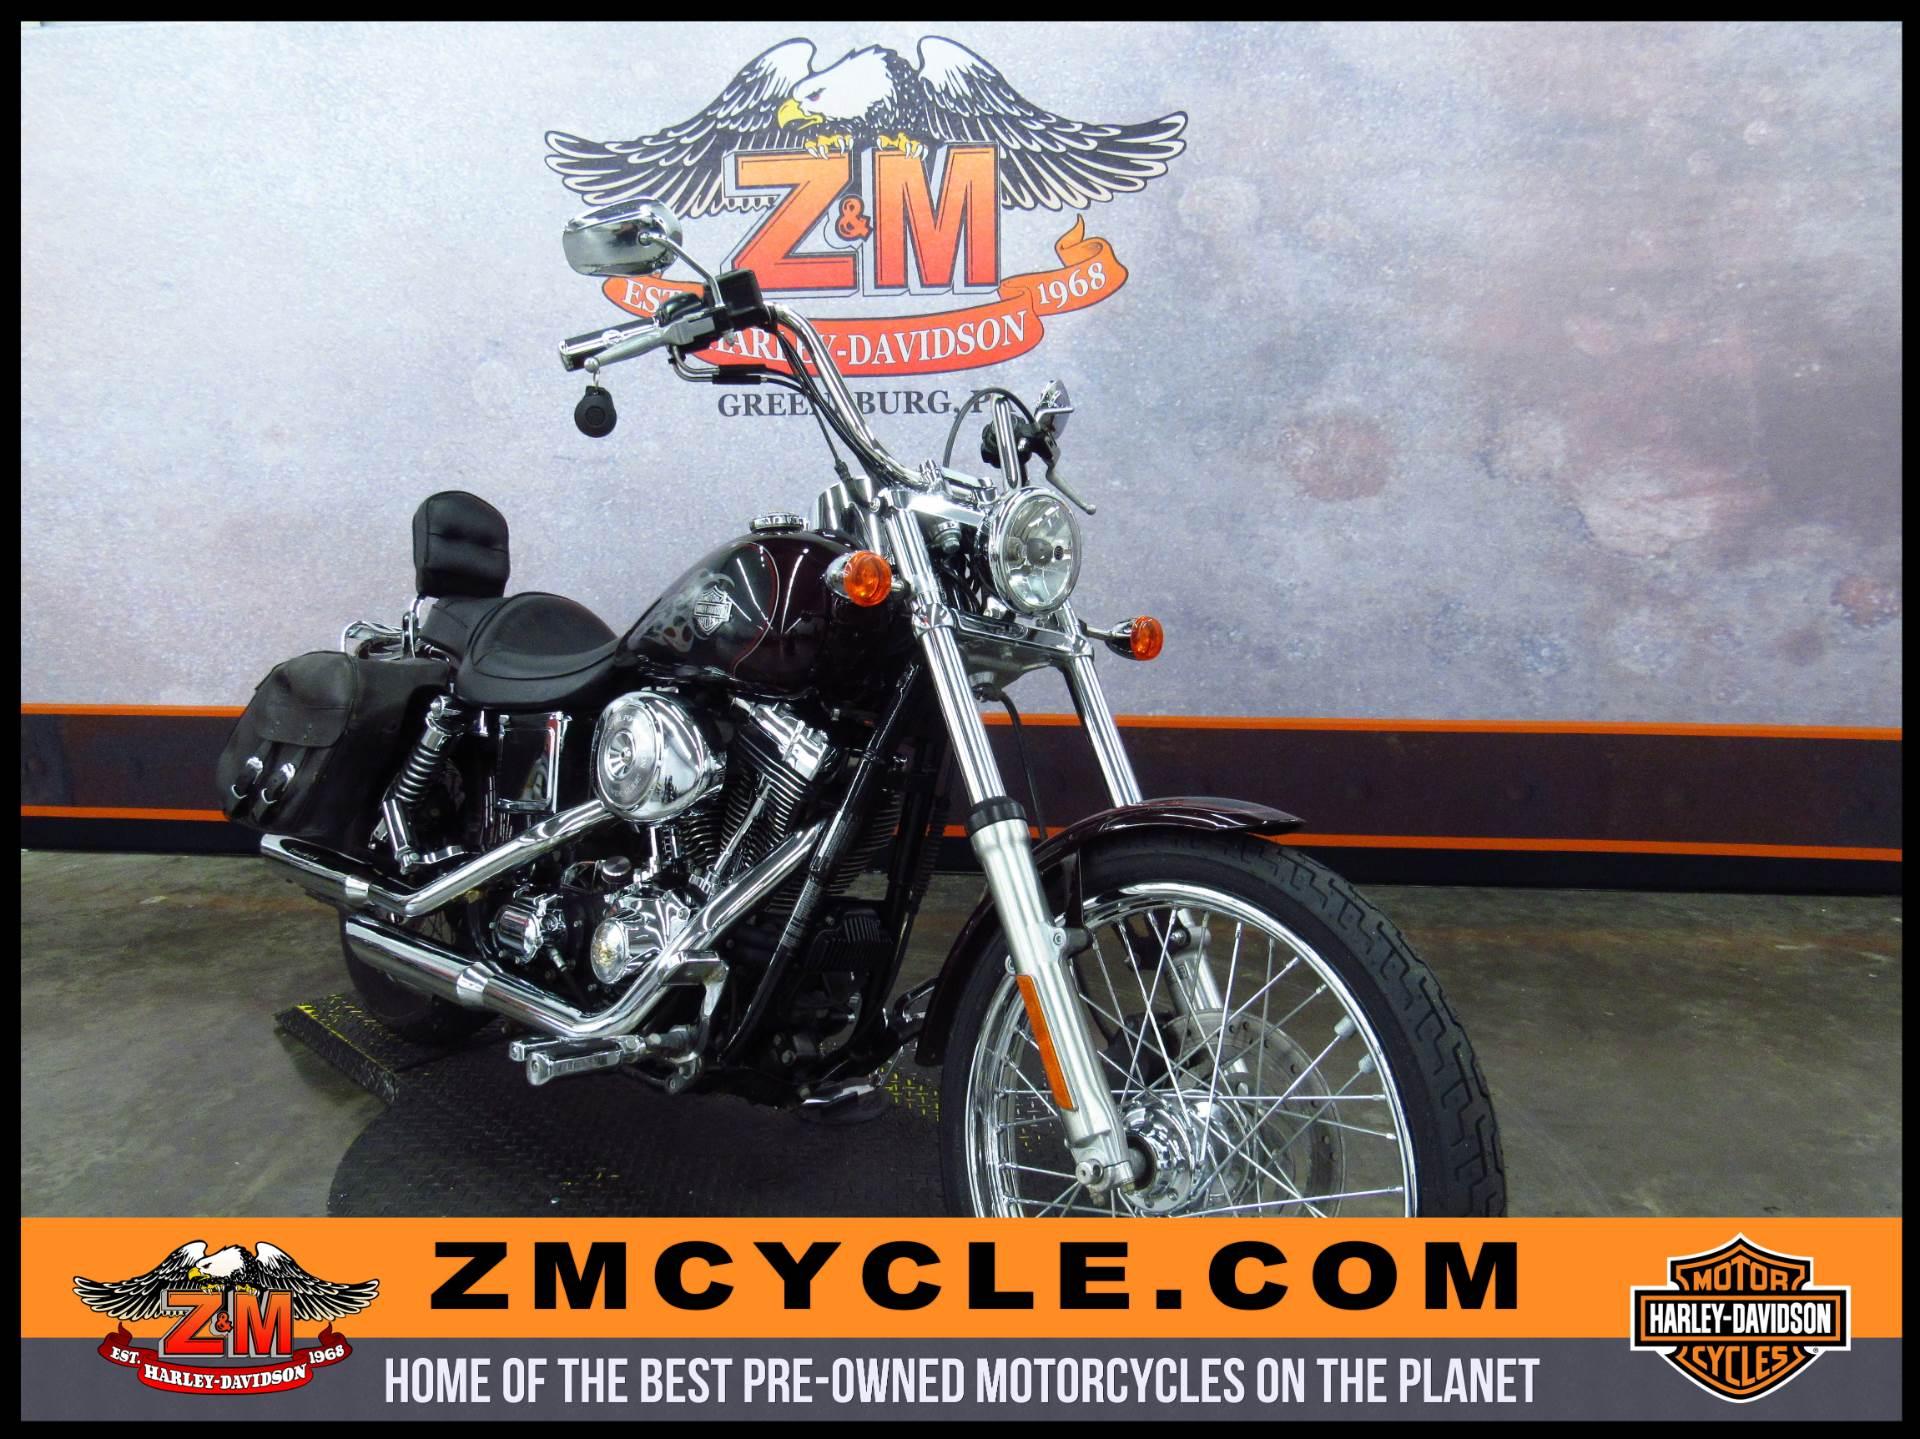 2005 FXDWG/FXDWGI Dyna Wide Glide